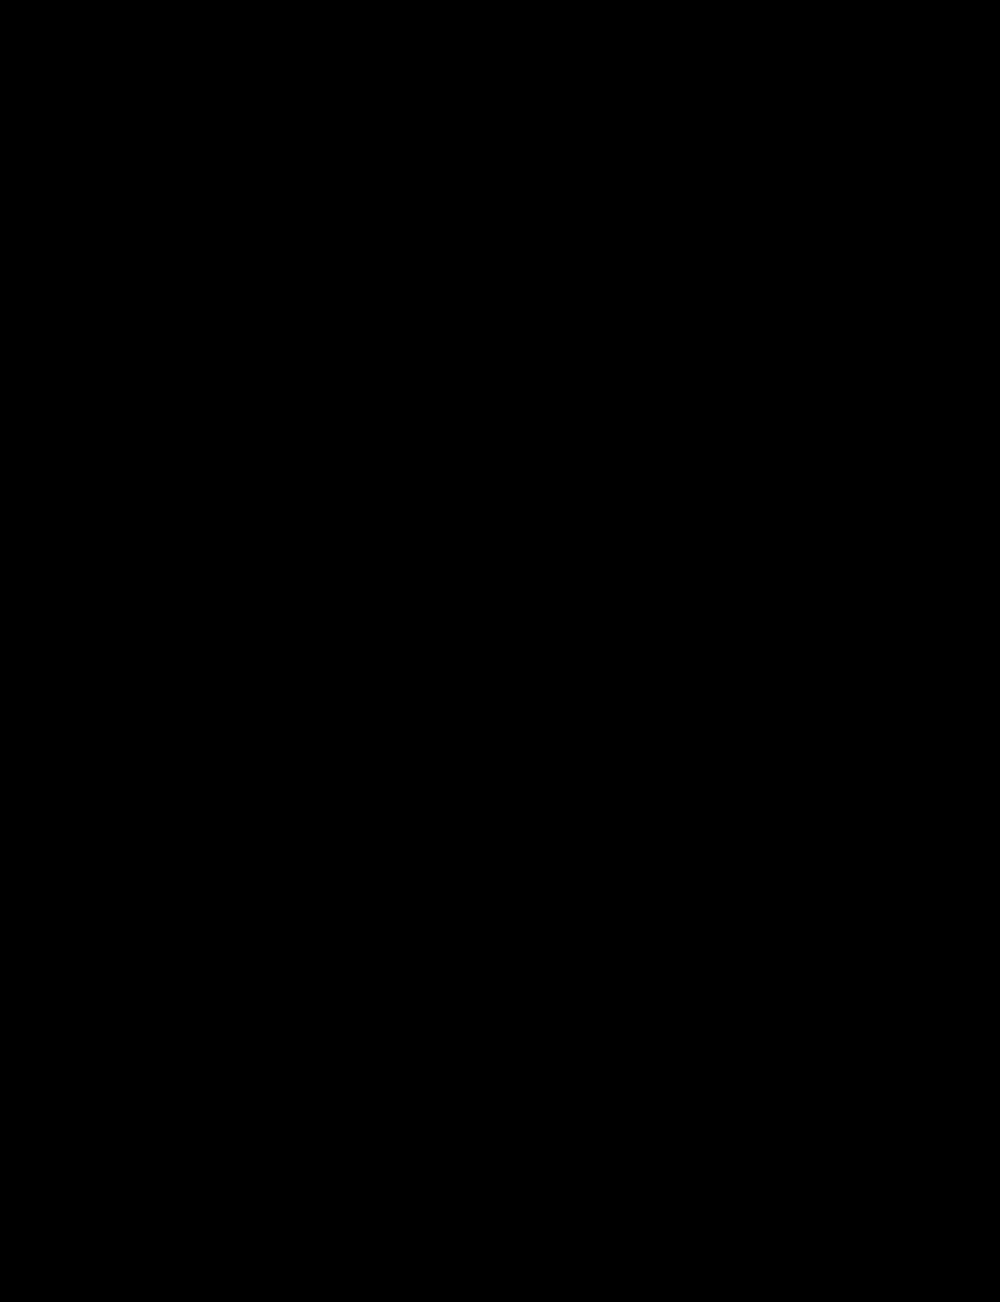 Volume éŽbouriffŽé